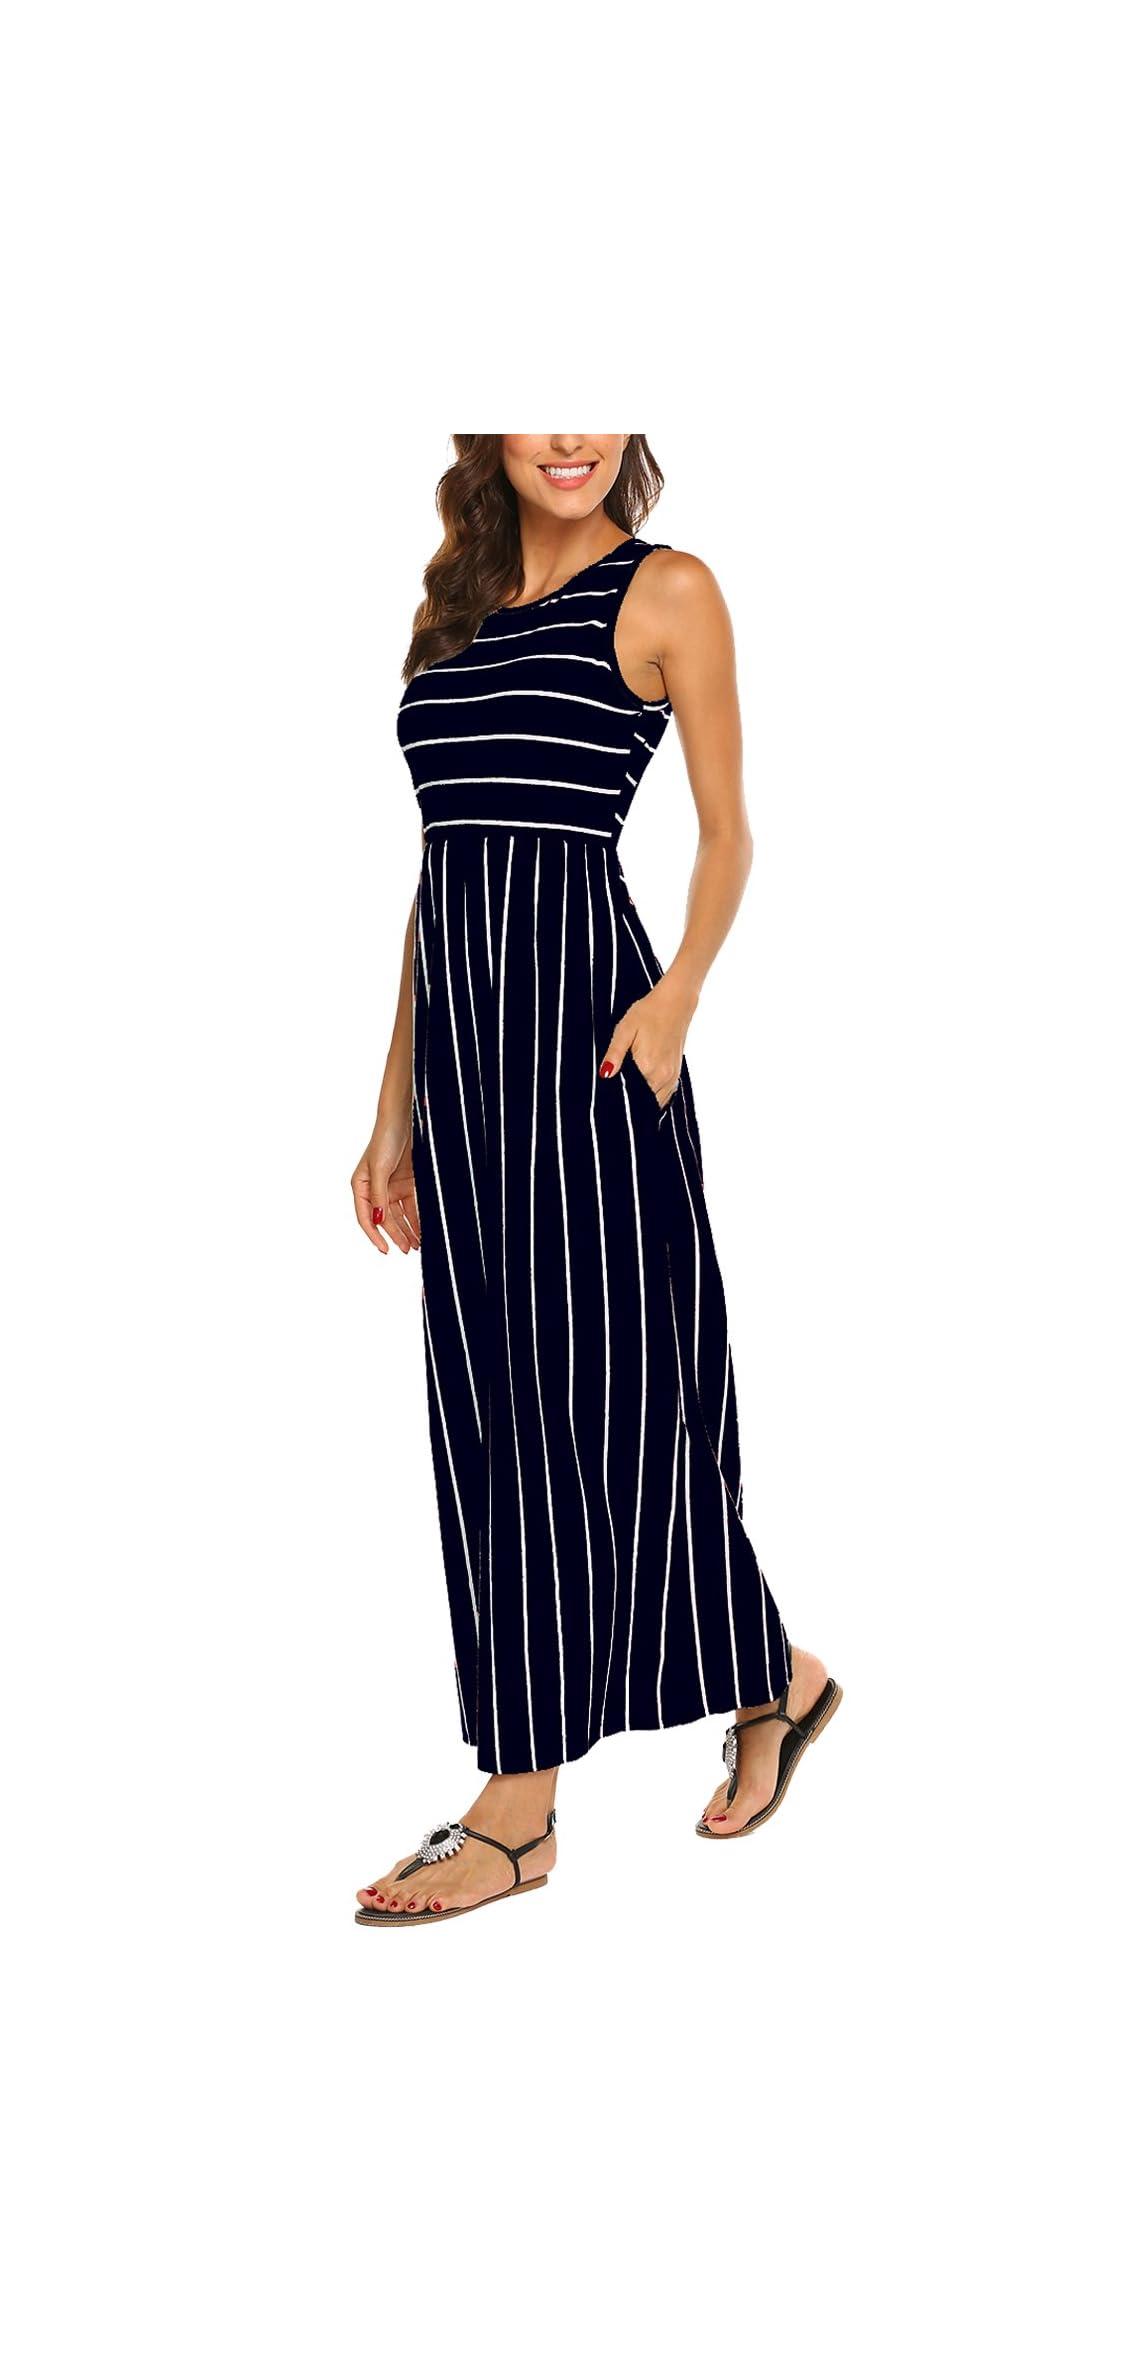 Women's Summer Sleeveless Striped Flowy Casual Long Maxi